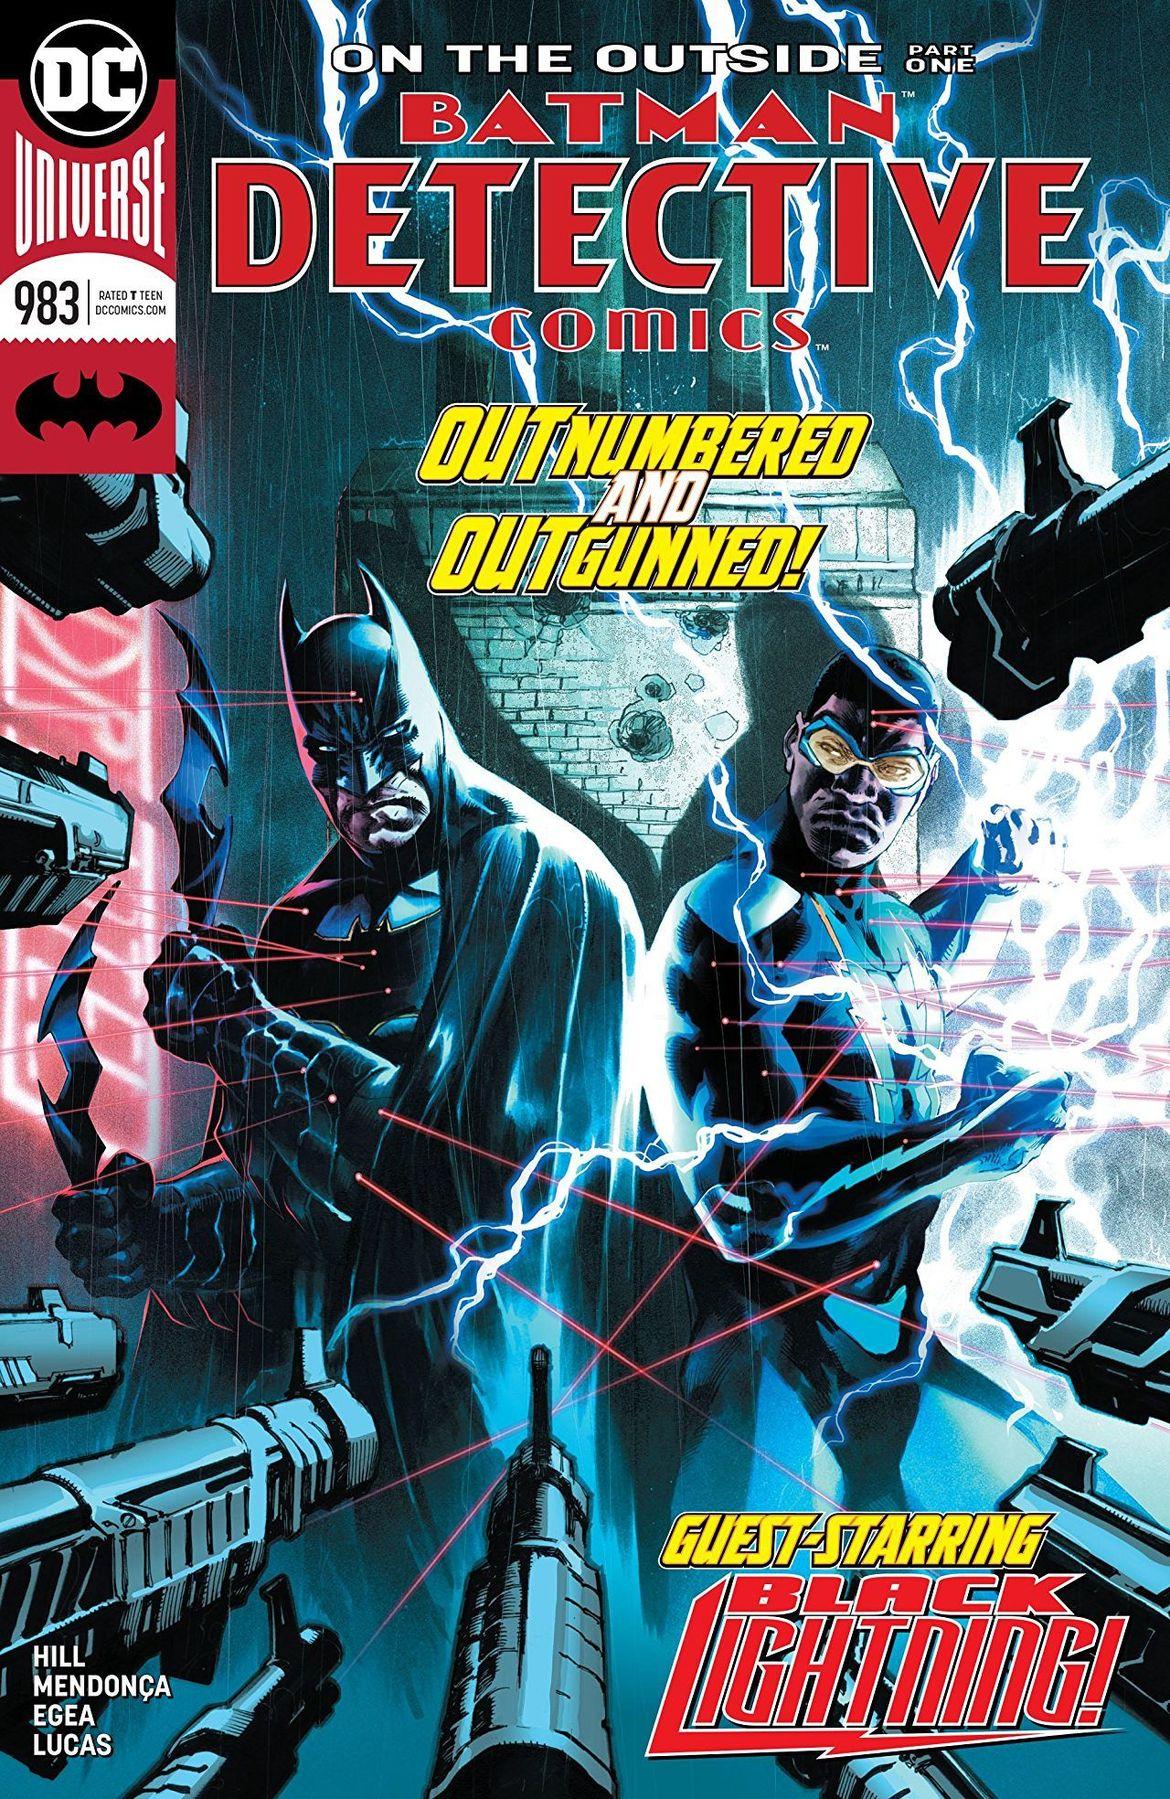 Detetive Comics